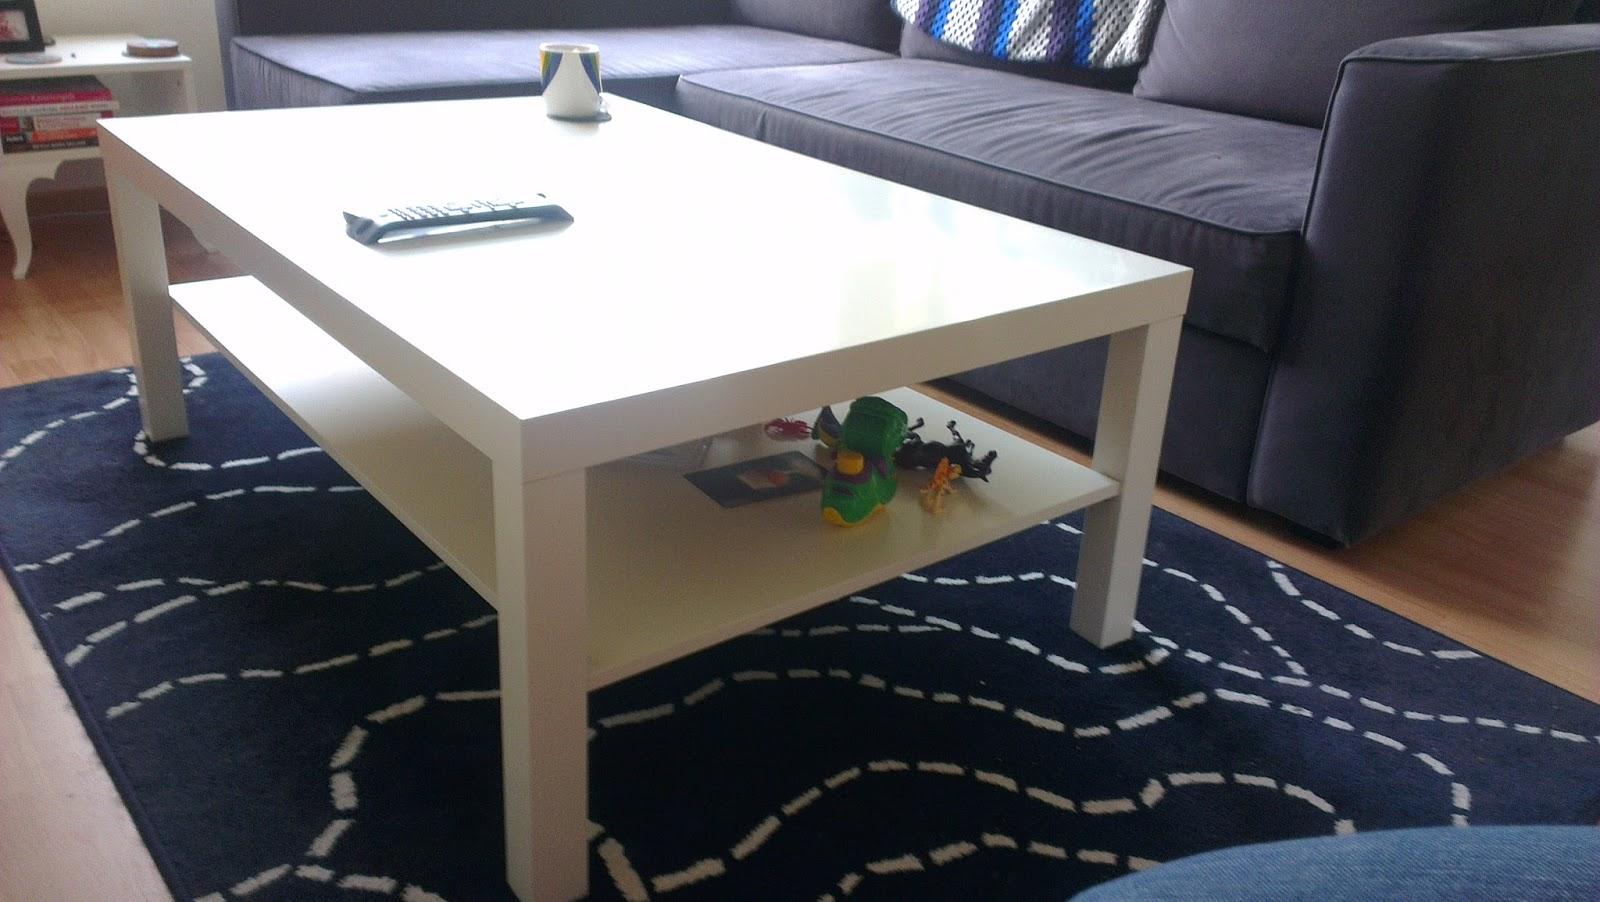 ace the adventure ikea vrijdag lack salontafel coffee table. Black Bedroom Furniture Sets. Home Design Ideas